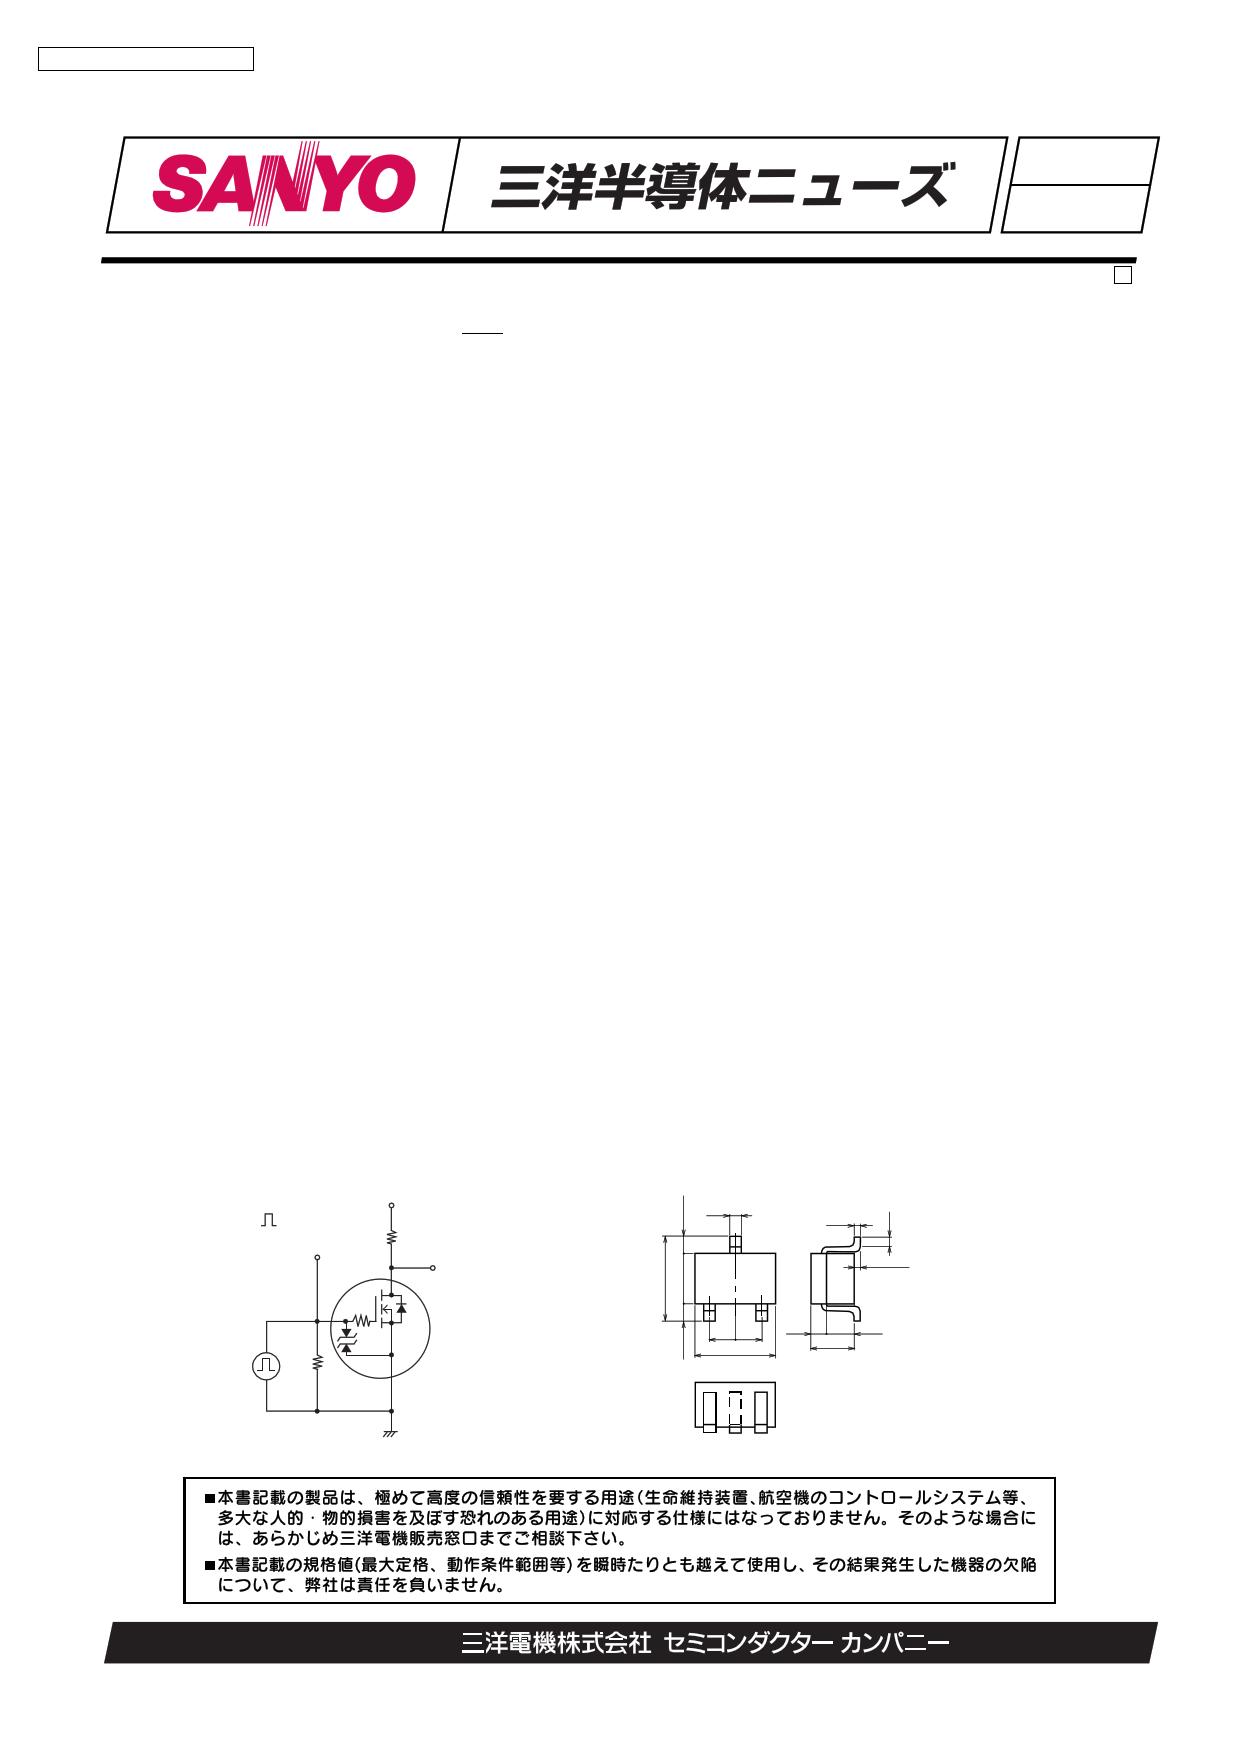 400CNQ035 دیتاشیت PDF